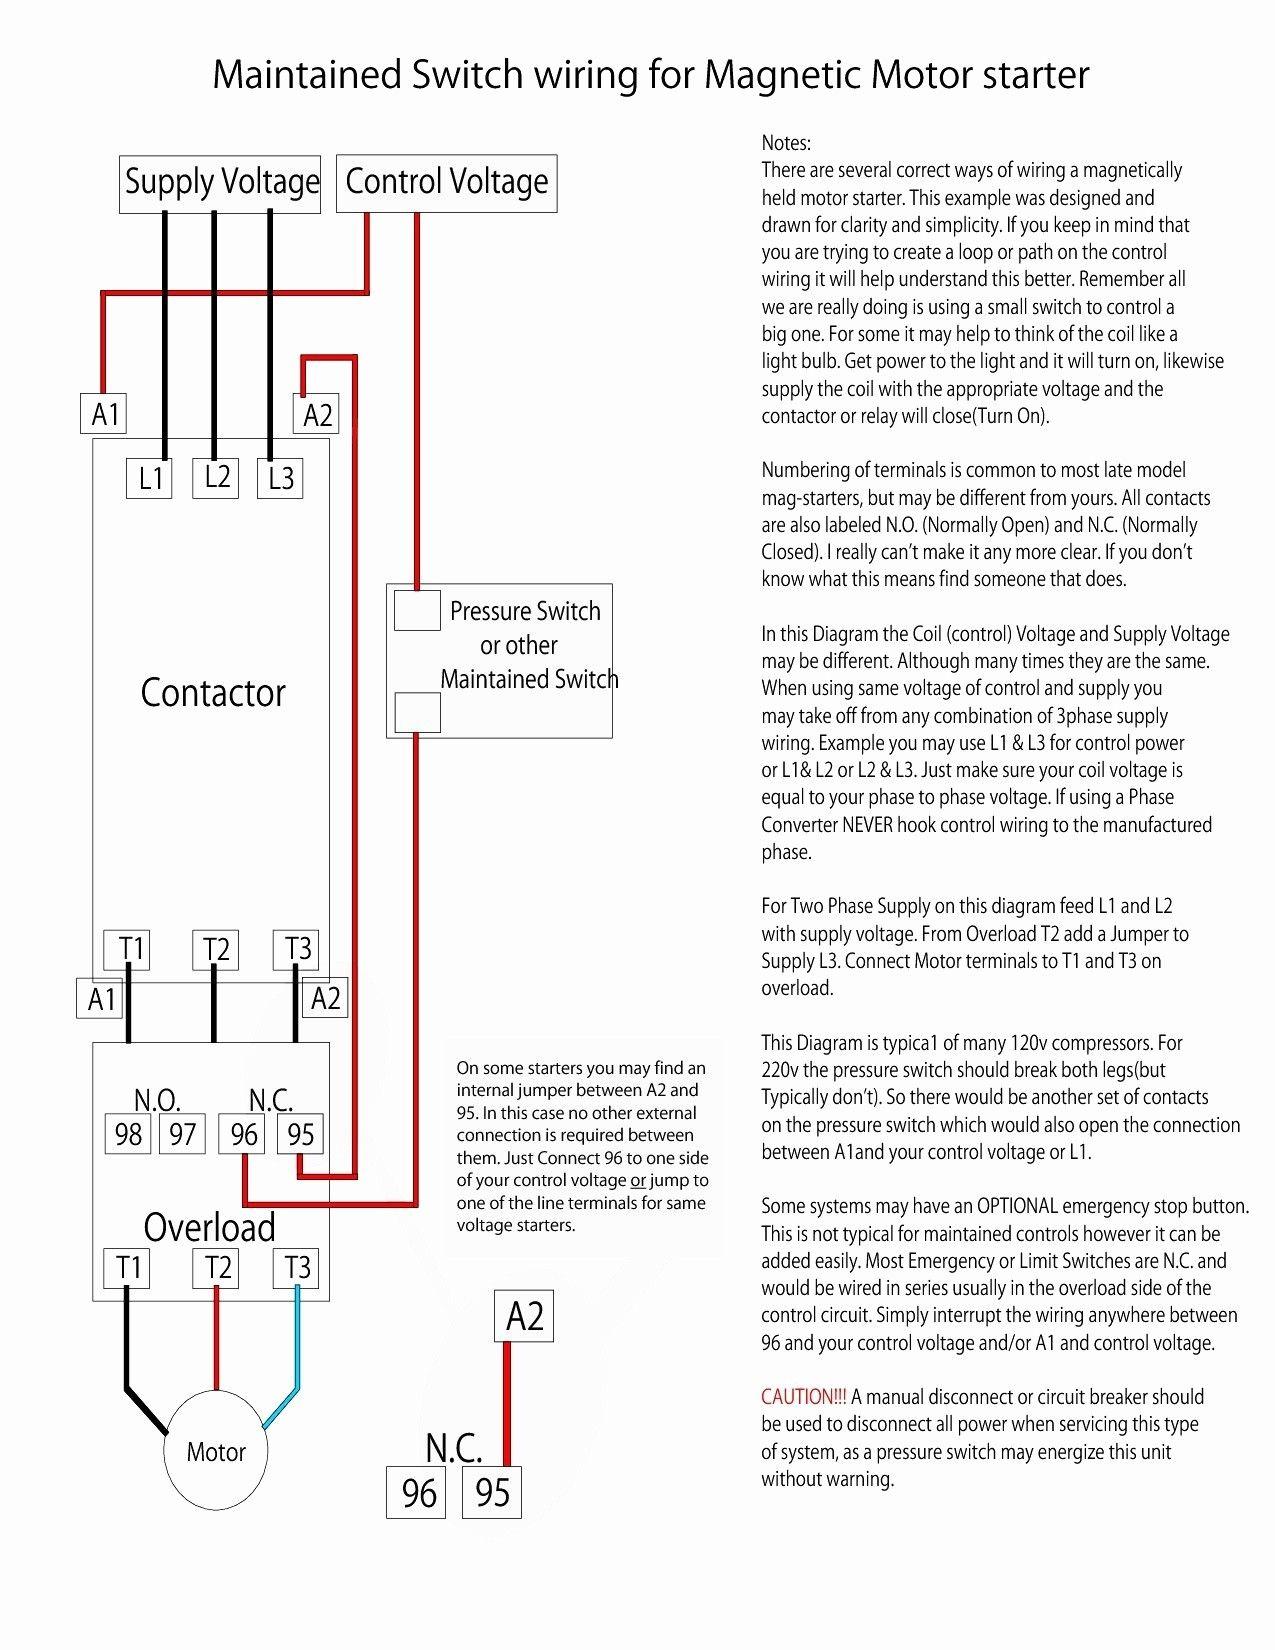 new electrical wiring diagram toyota avanza diagram diagramtemplate diagramsample [ 1275 x 1650 Pixel ]